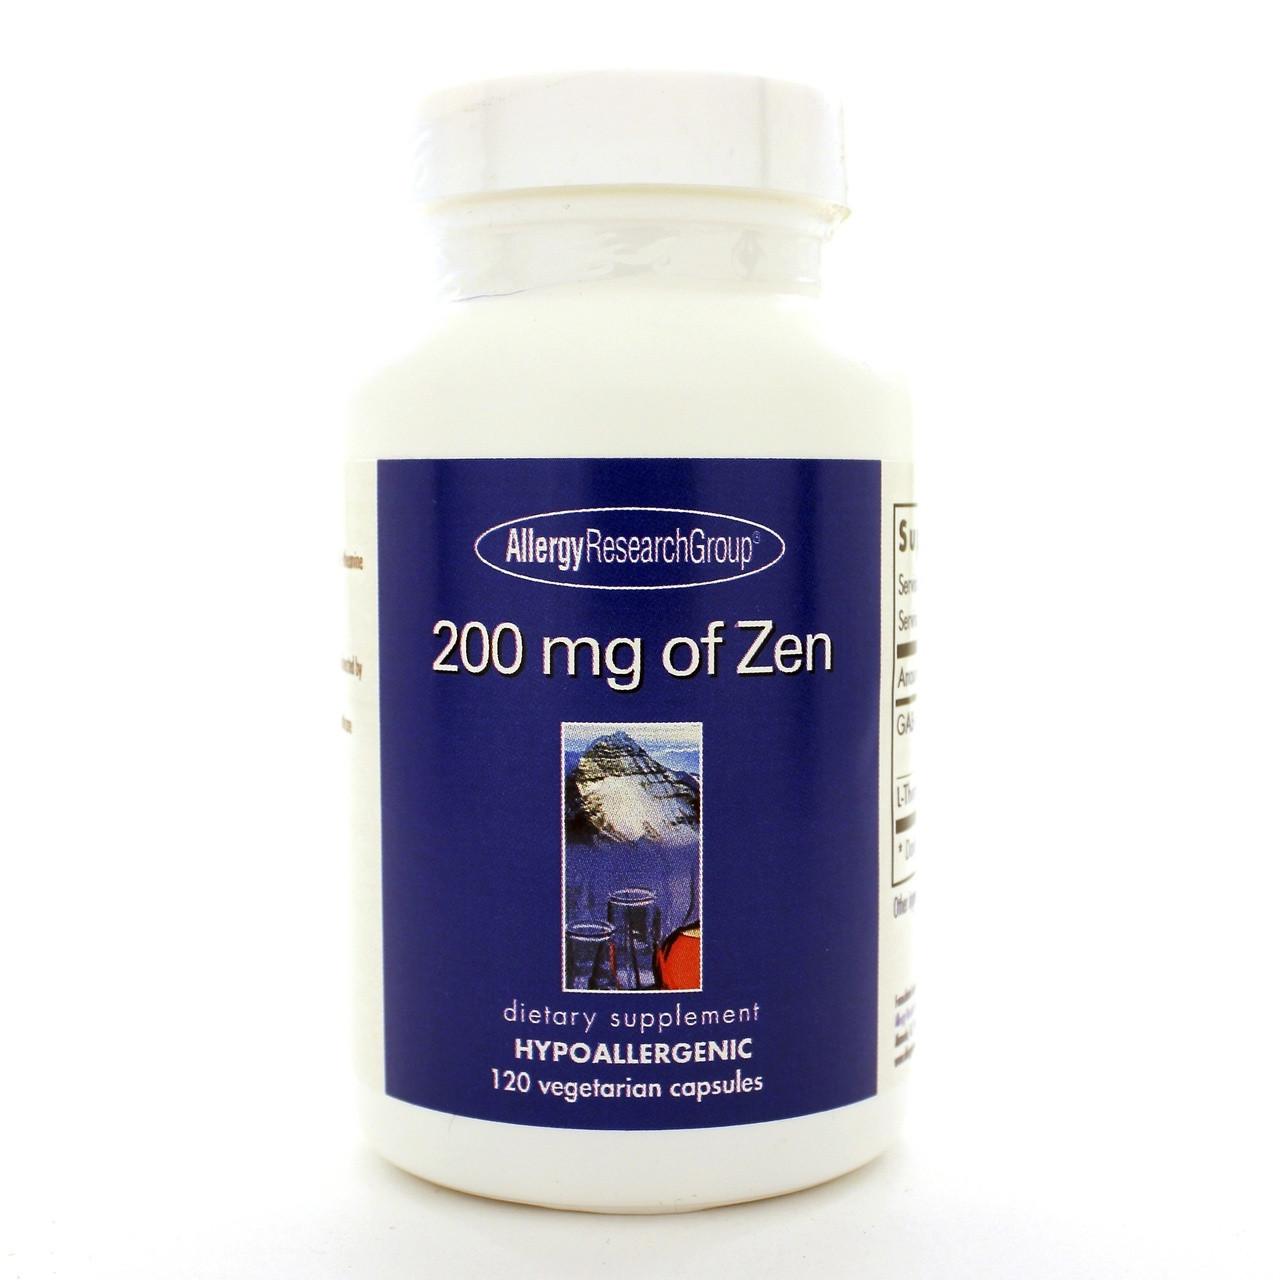 Allergy Research Group 200 mg of Zen 120 caps